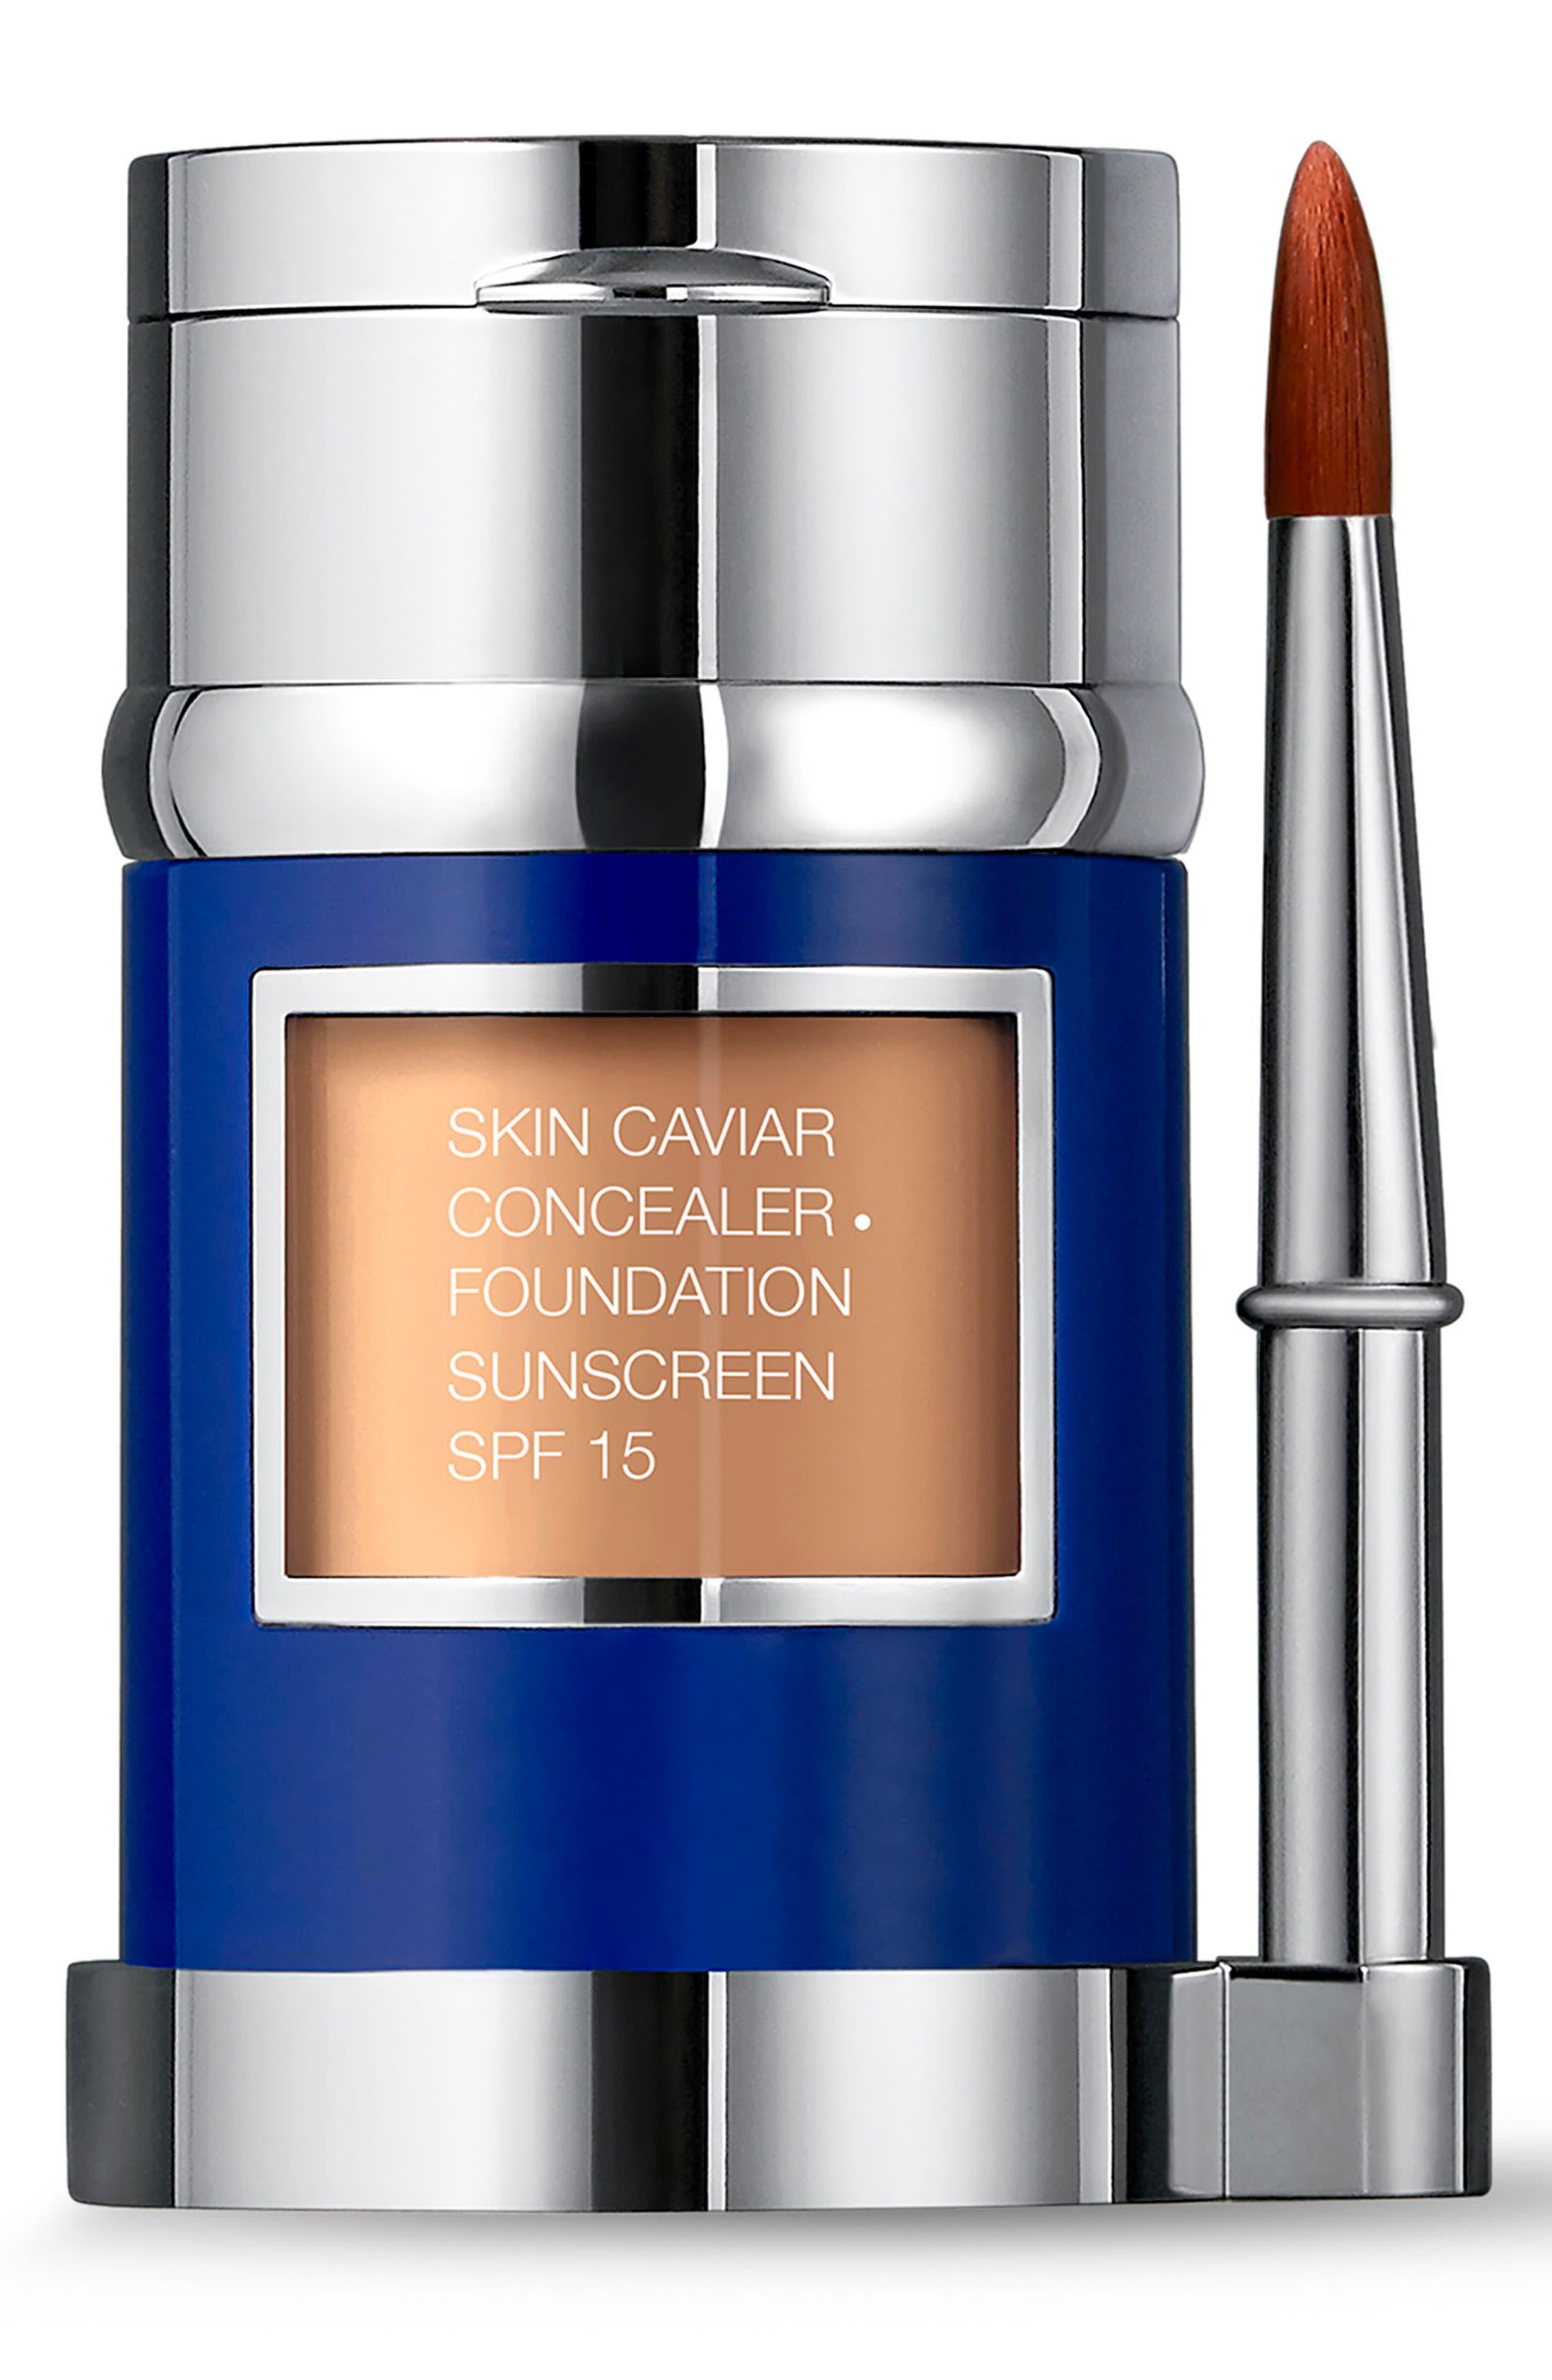 Alternate Image 1 Selected - La Prairie 'Skin Caviar' Concealer + Foundation Sunscreen SPF 15